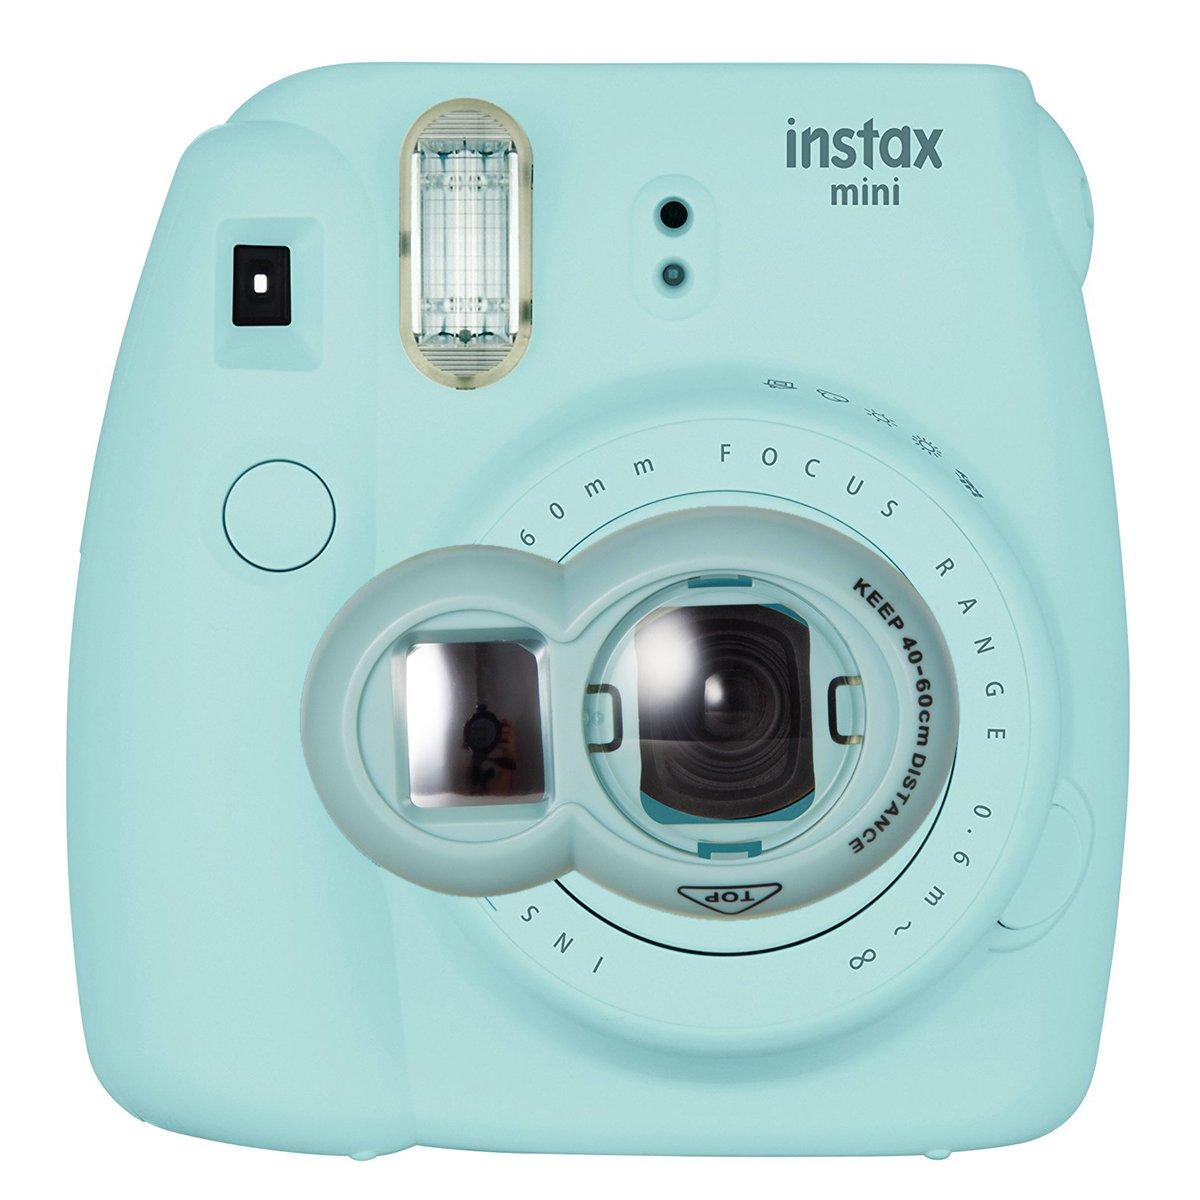 CAIUL Compatible Mini 9 Close Up Selfie Lens with Self-Portrait Mirror for Fujifilm Instax Mini 9 8 8+ 7s, Polaroid 300 Camera (Ice Blue)